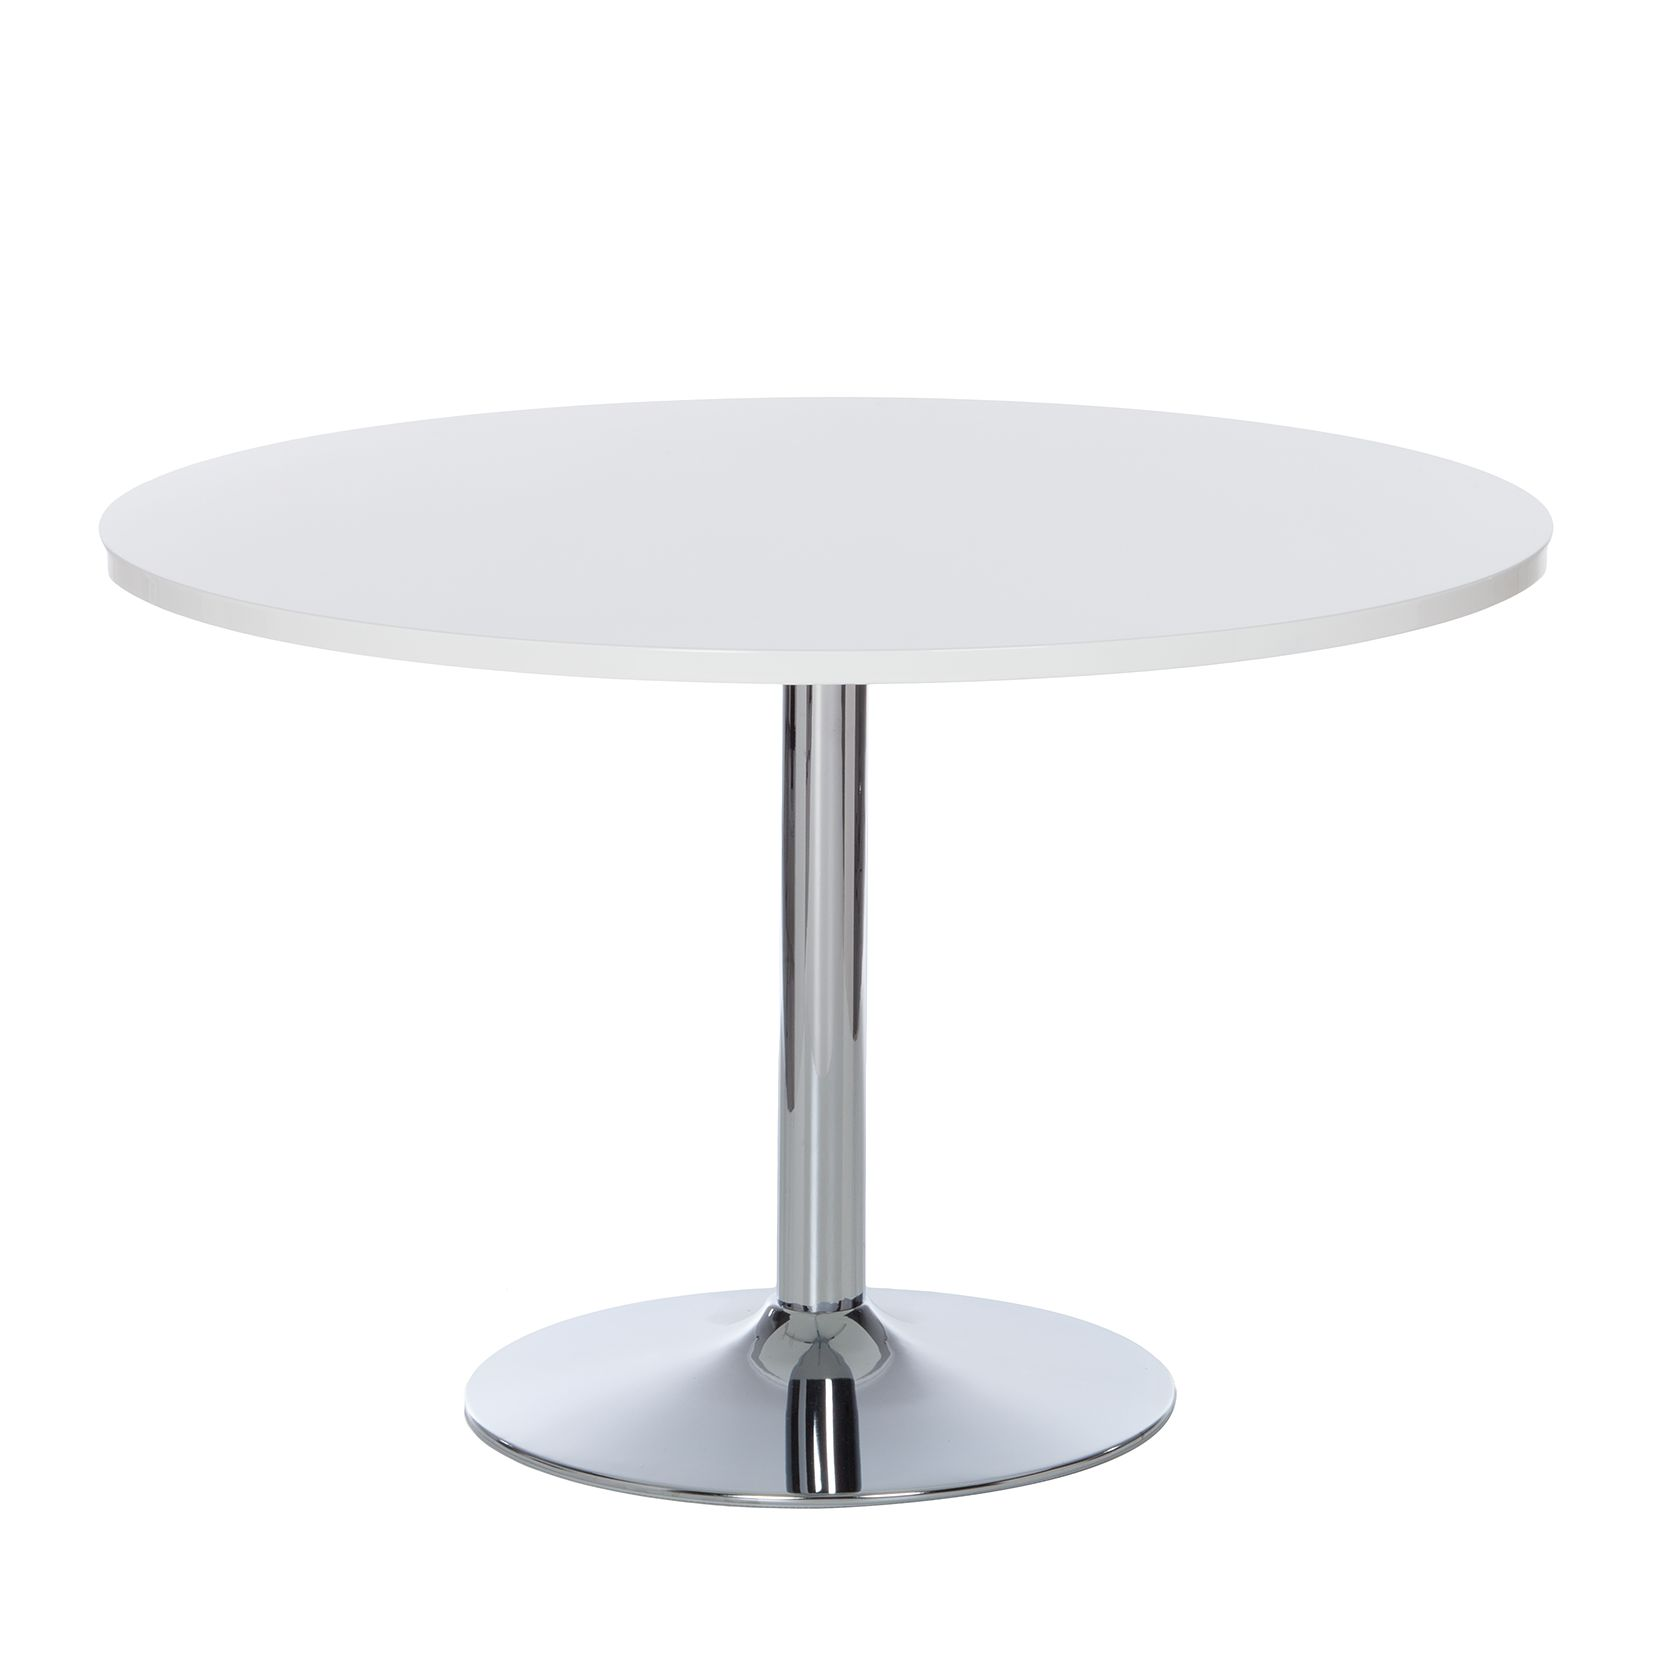 Table à manger Matilda - Blanc brillant, Fredriks